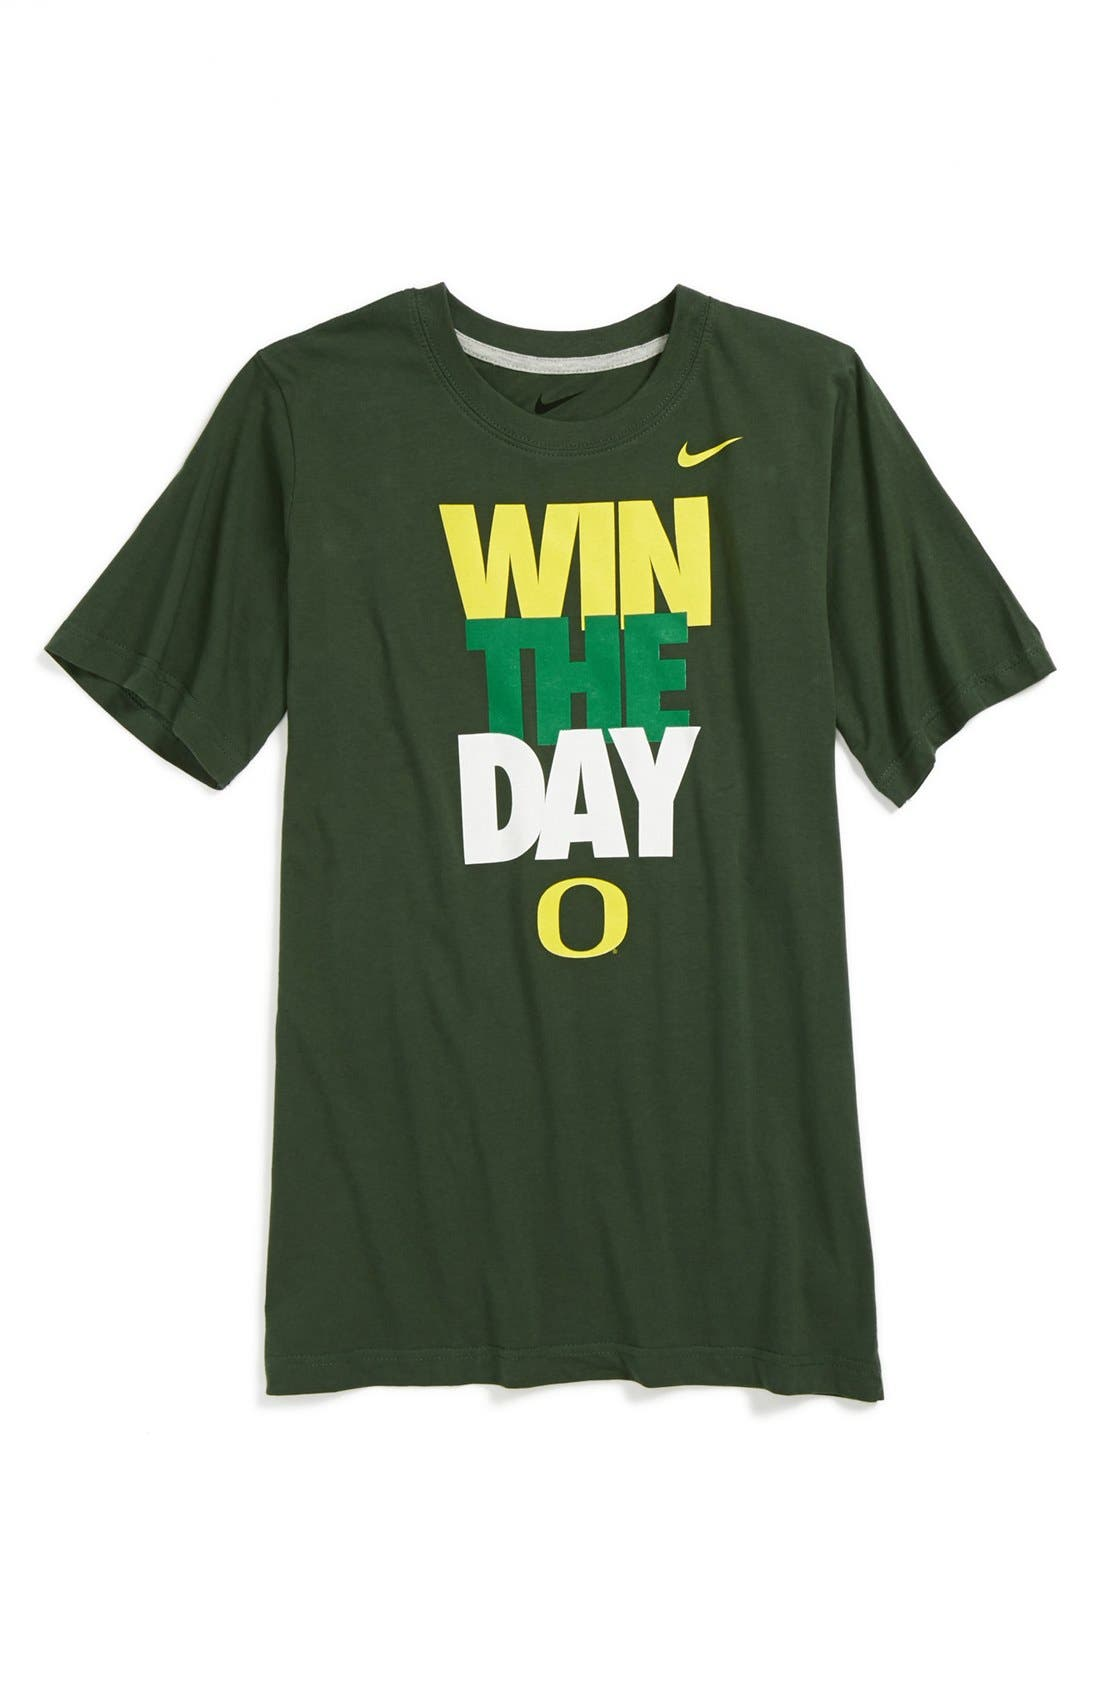 Alternate Image 1 Selected - Nike 'Win the Day - Oregon Ducks' T-Shirt (Big Boys)